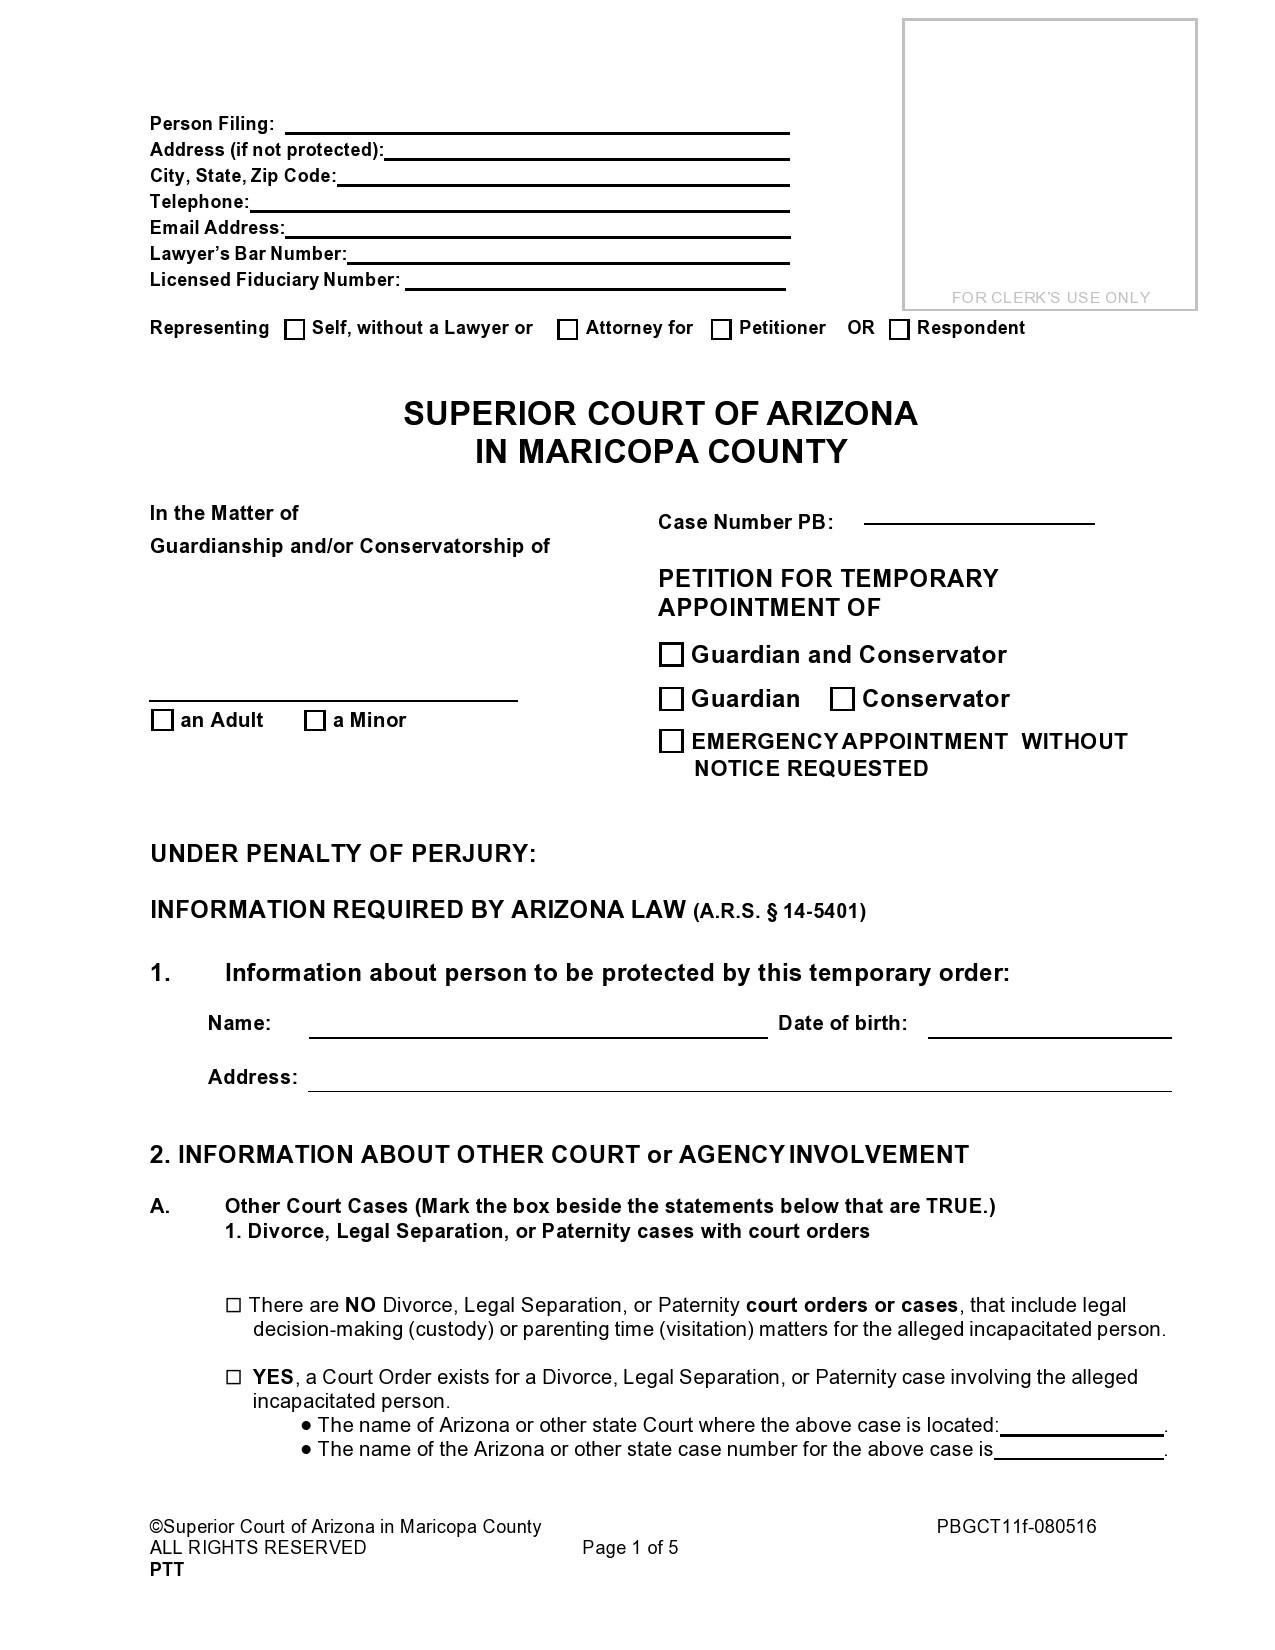 Free temporary guardianship form 15